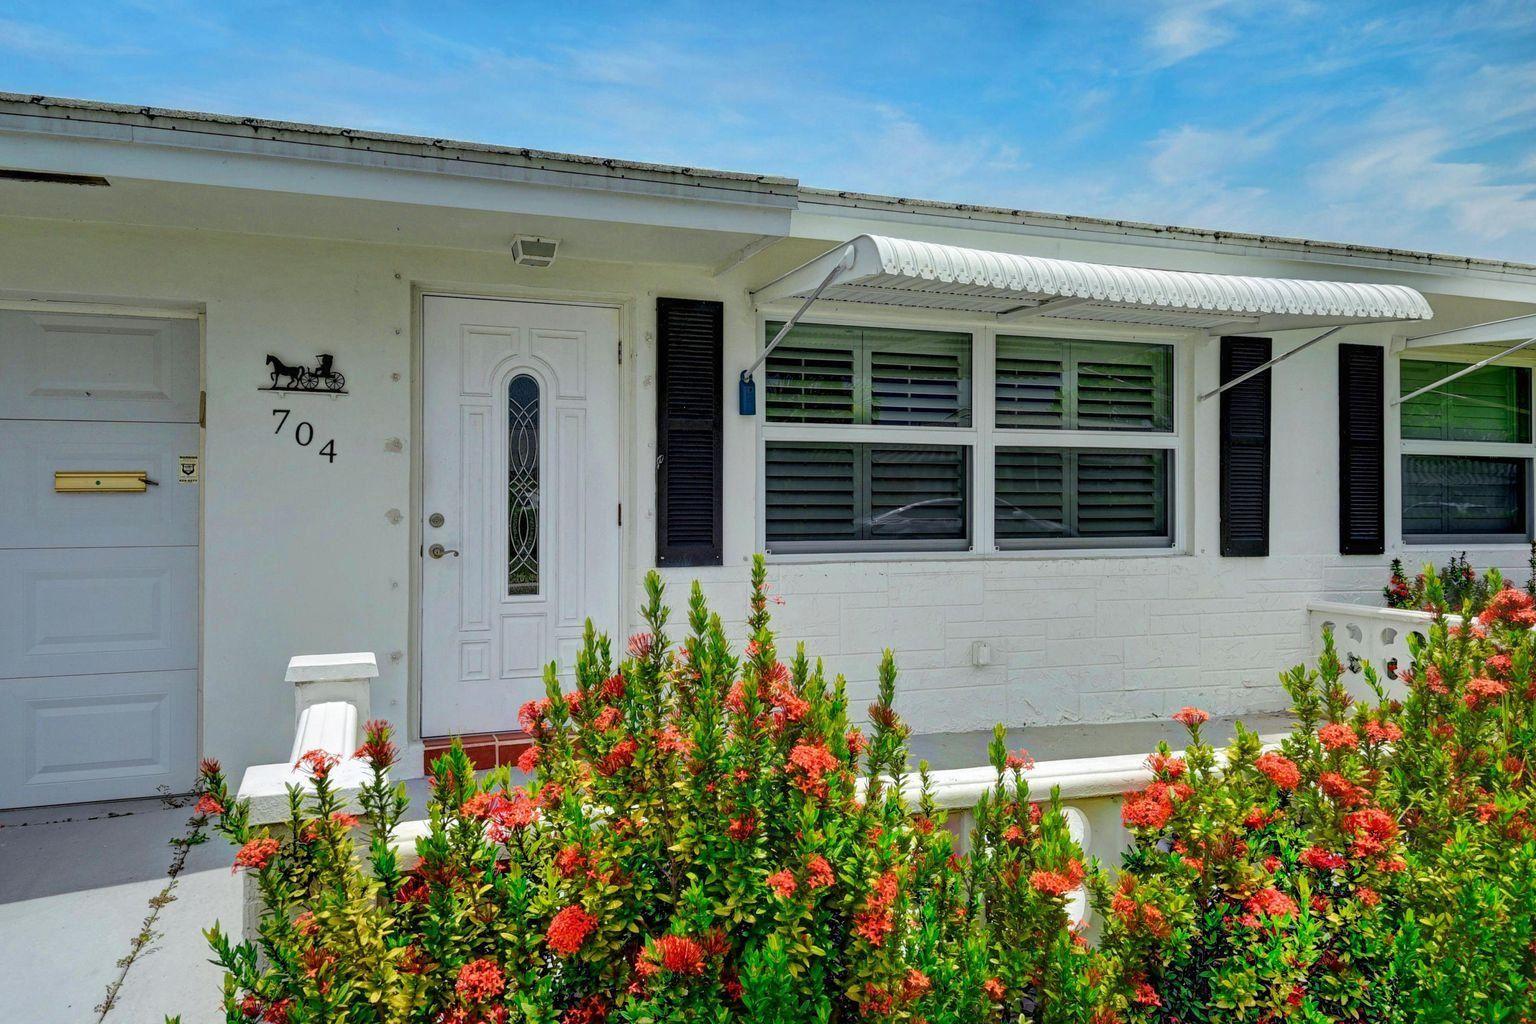 Photo of 704 SW Lake Court, Boynton Beach, FL 33426 (MLS # RX-10686927)